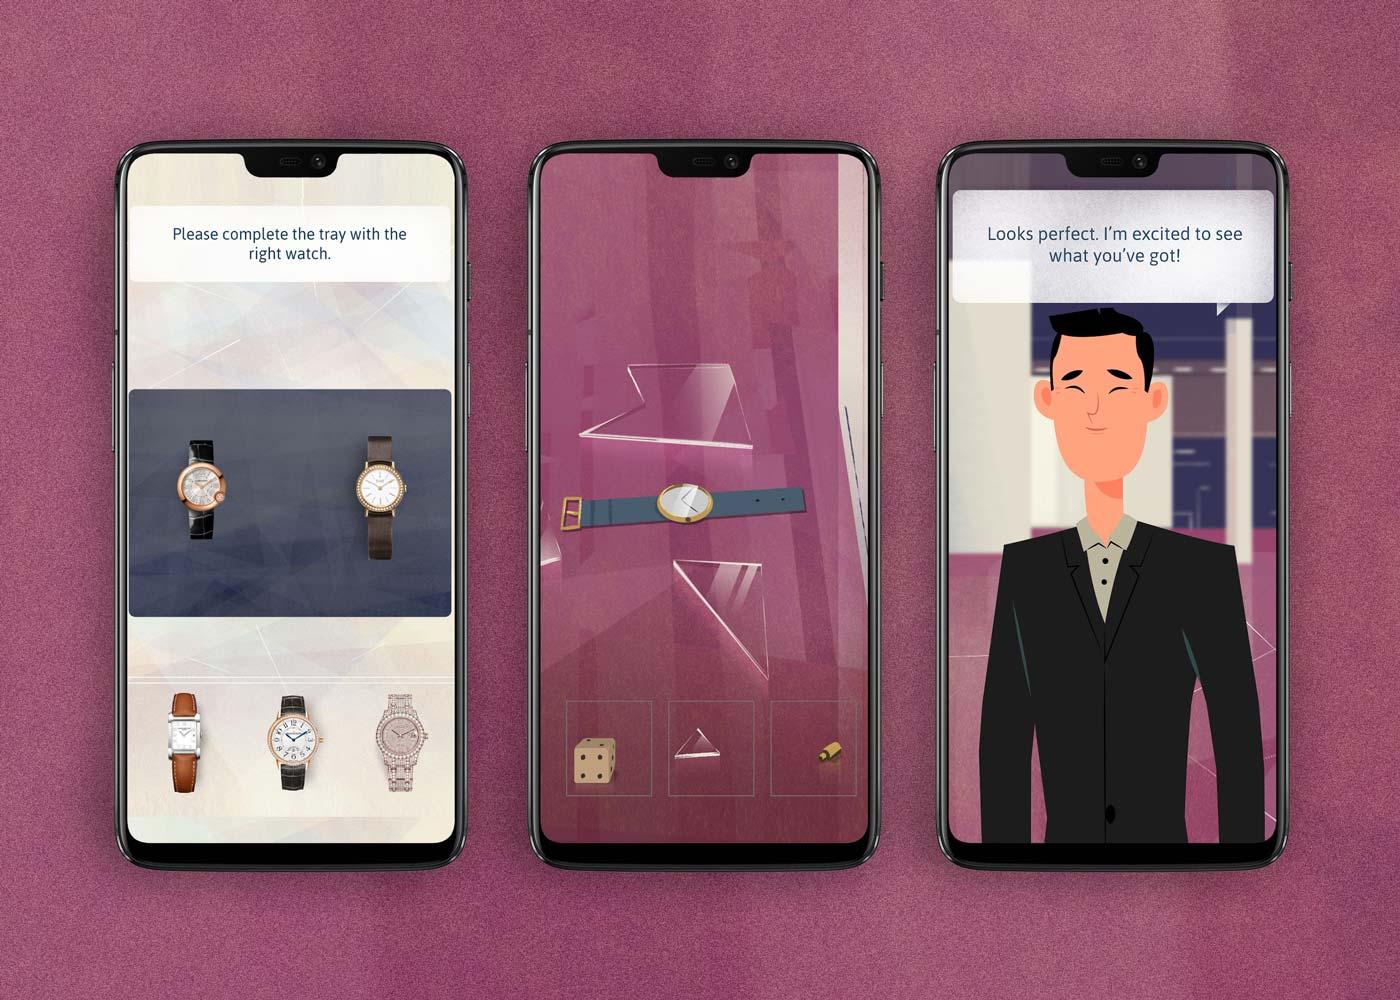 adesias-etude-de-cas-brand-richemont-mobile-learning-5